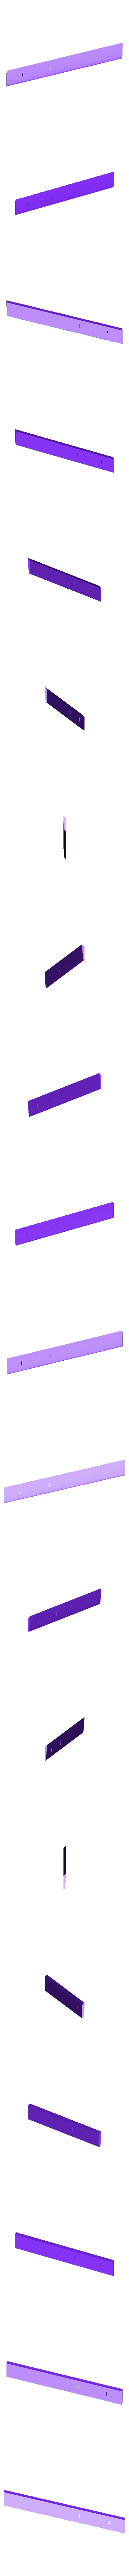 Aileron-2 Rev01.STL Download free STL file V1 Release - New RC Plane • 3D printable design, Trikonics